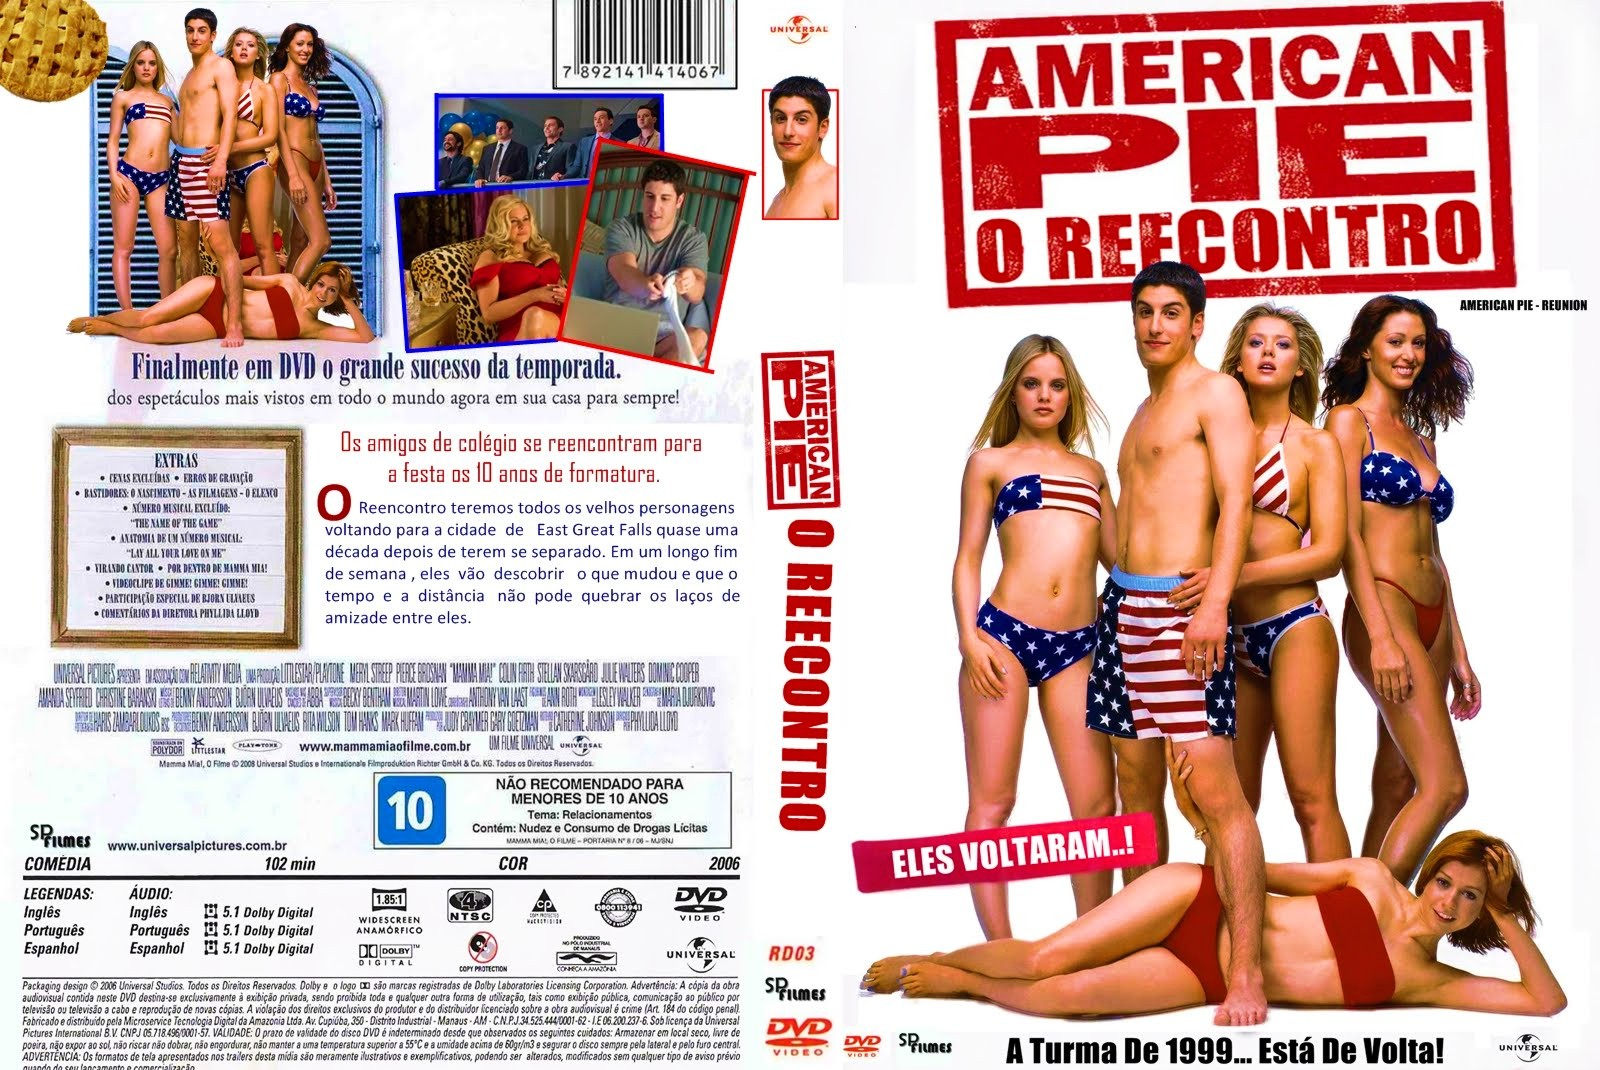 http://4.bp.blogspot.com/-q_Dc4fX9y1U/Tvo4PGxan-I/AAAAAAAADS8/ry6CDTezQxc/s1600/American+Pie+-+O+Reencontro+%28capa+2%29.jpg